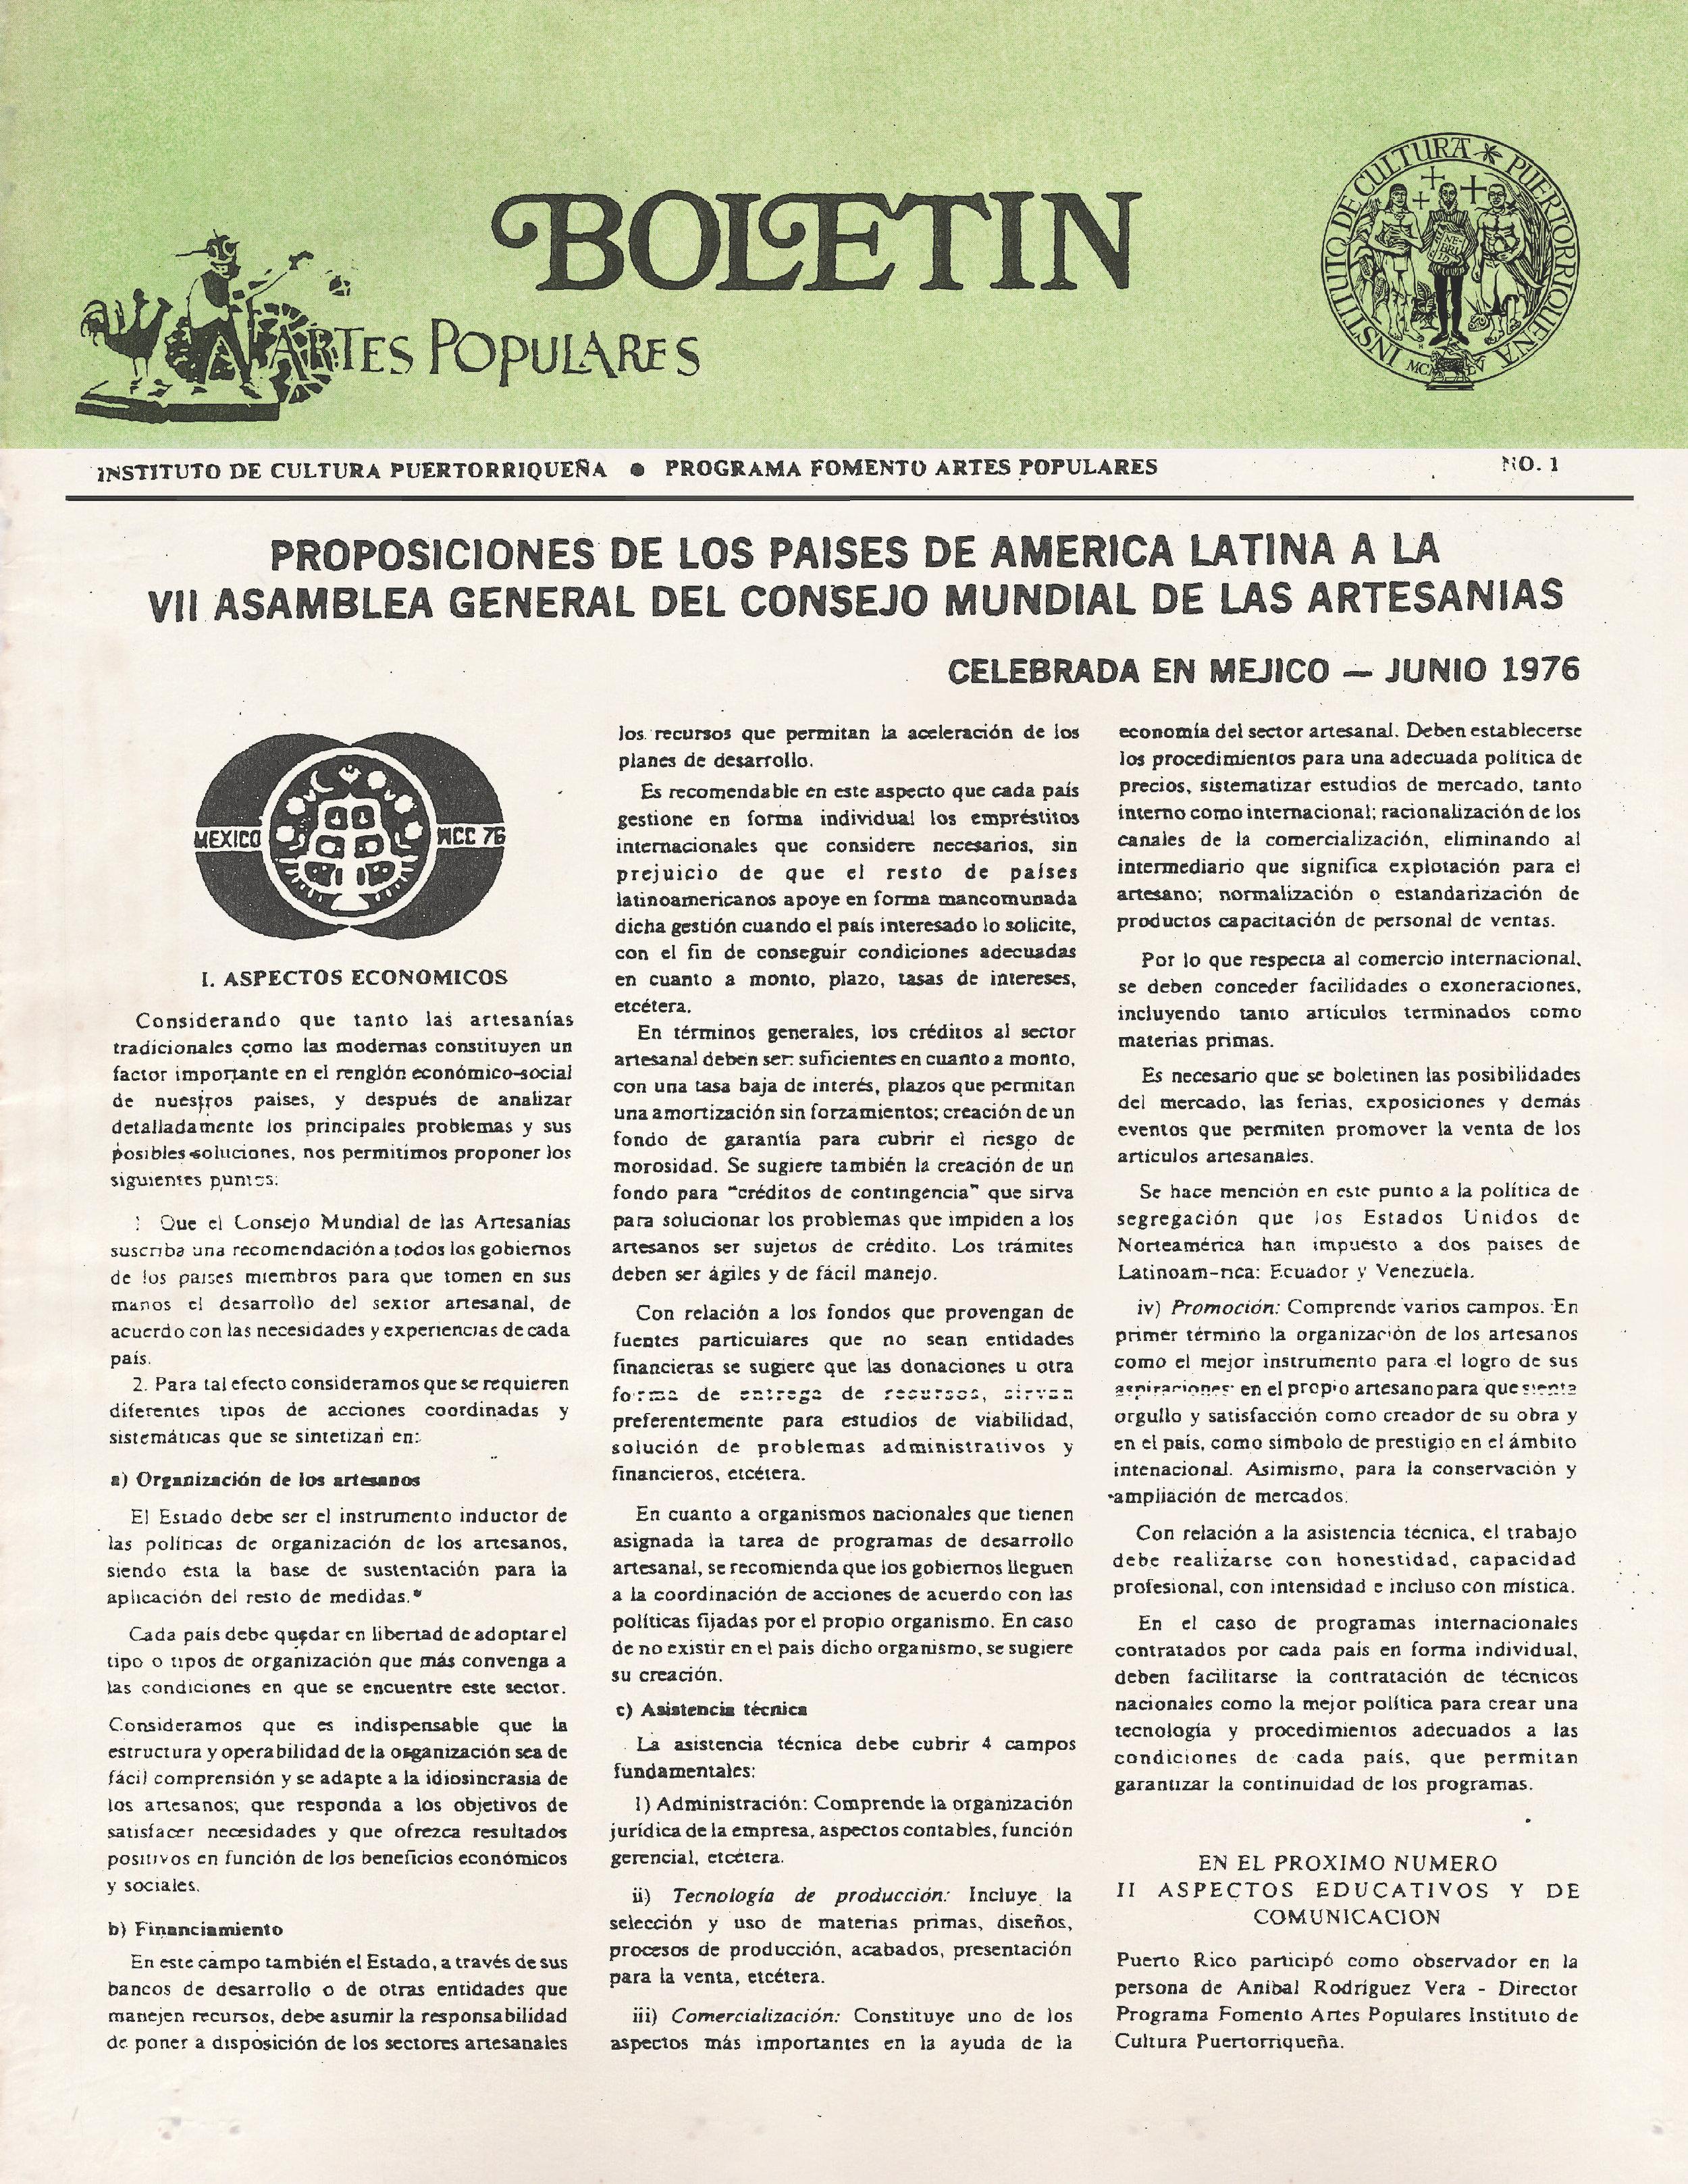 Boletín de Artes Populares #1.jpg